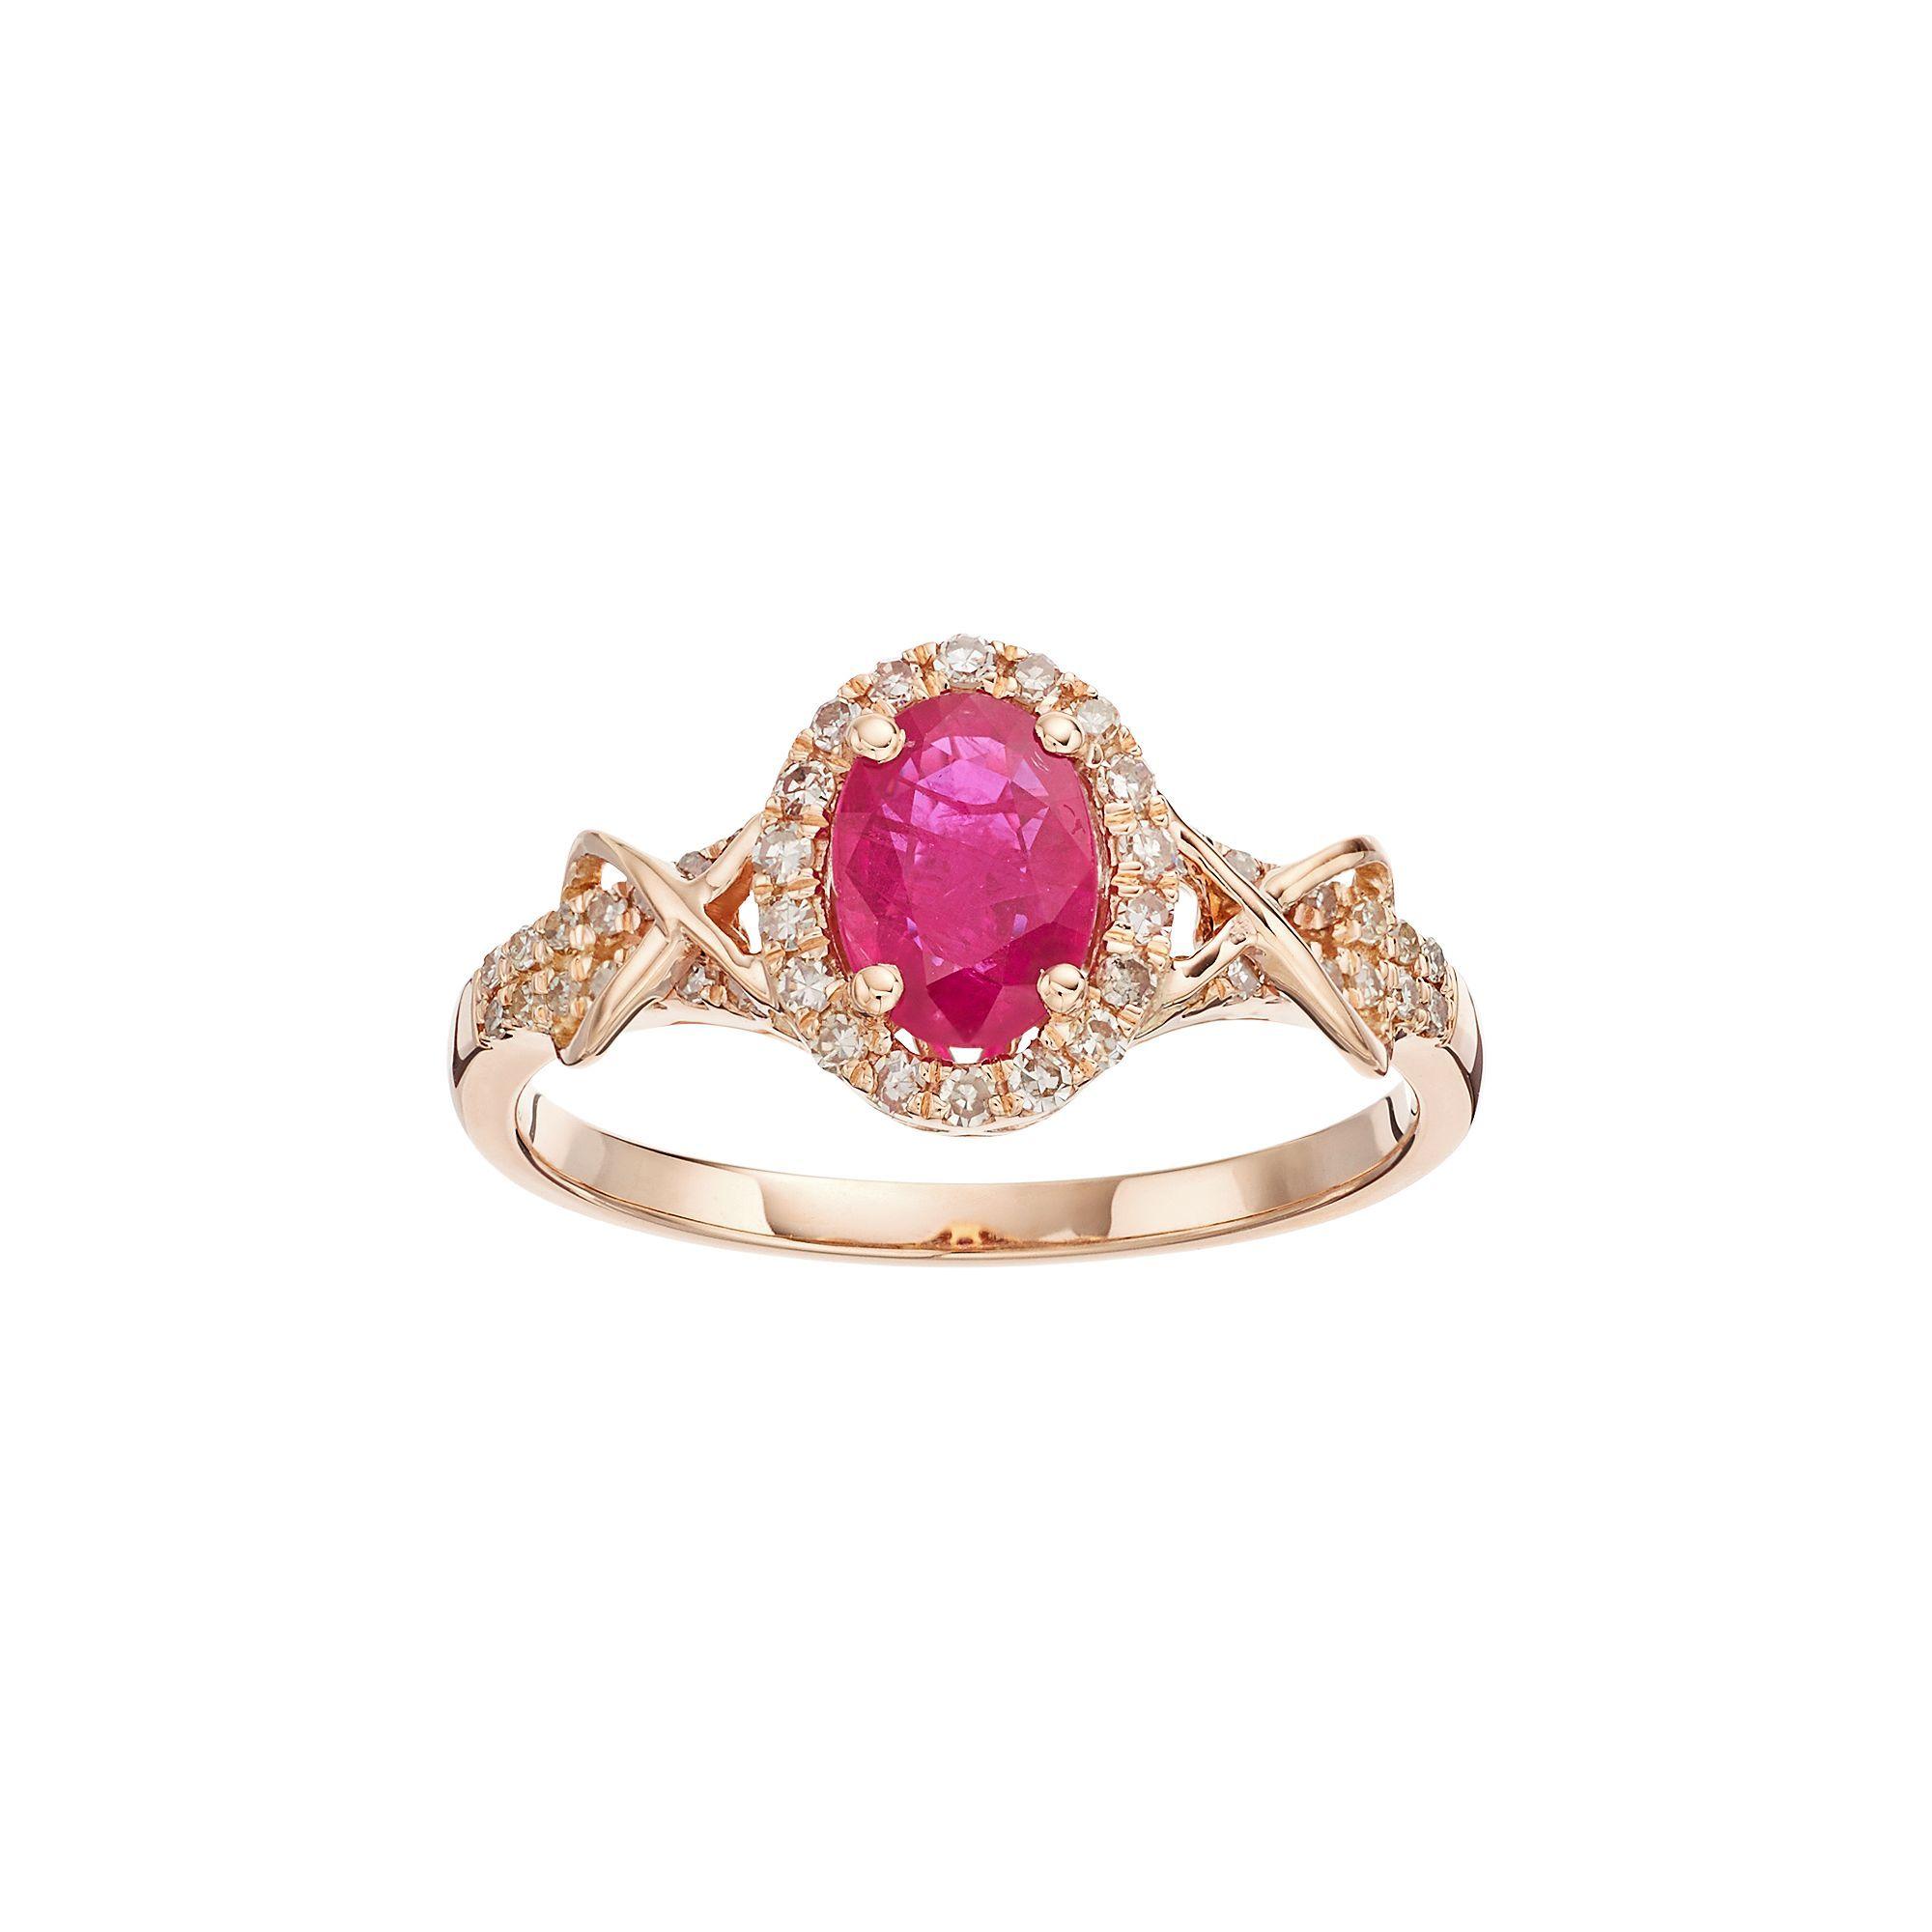 10k Rose Gold Ruby & 1/4 Carat T.W. Diamond Halo Ring, Women's, Size: 5, Red